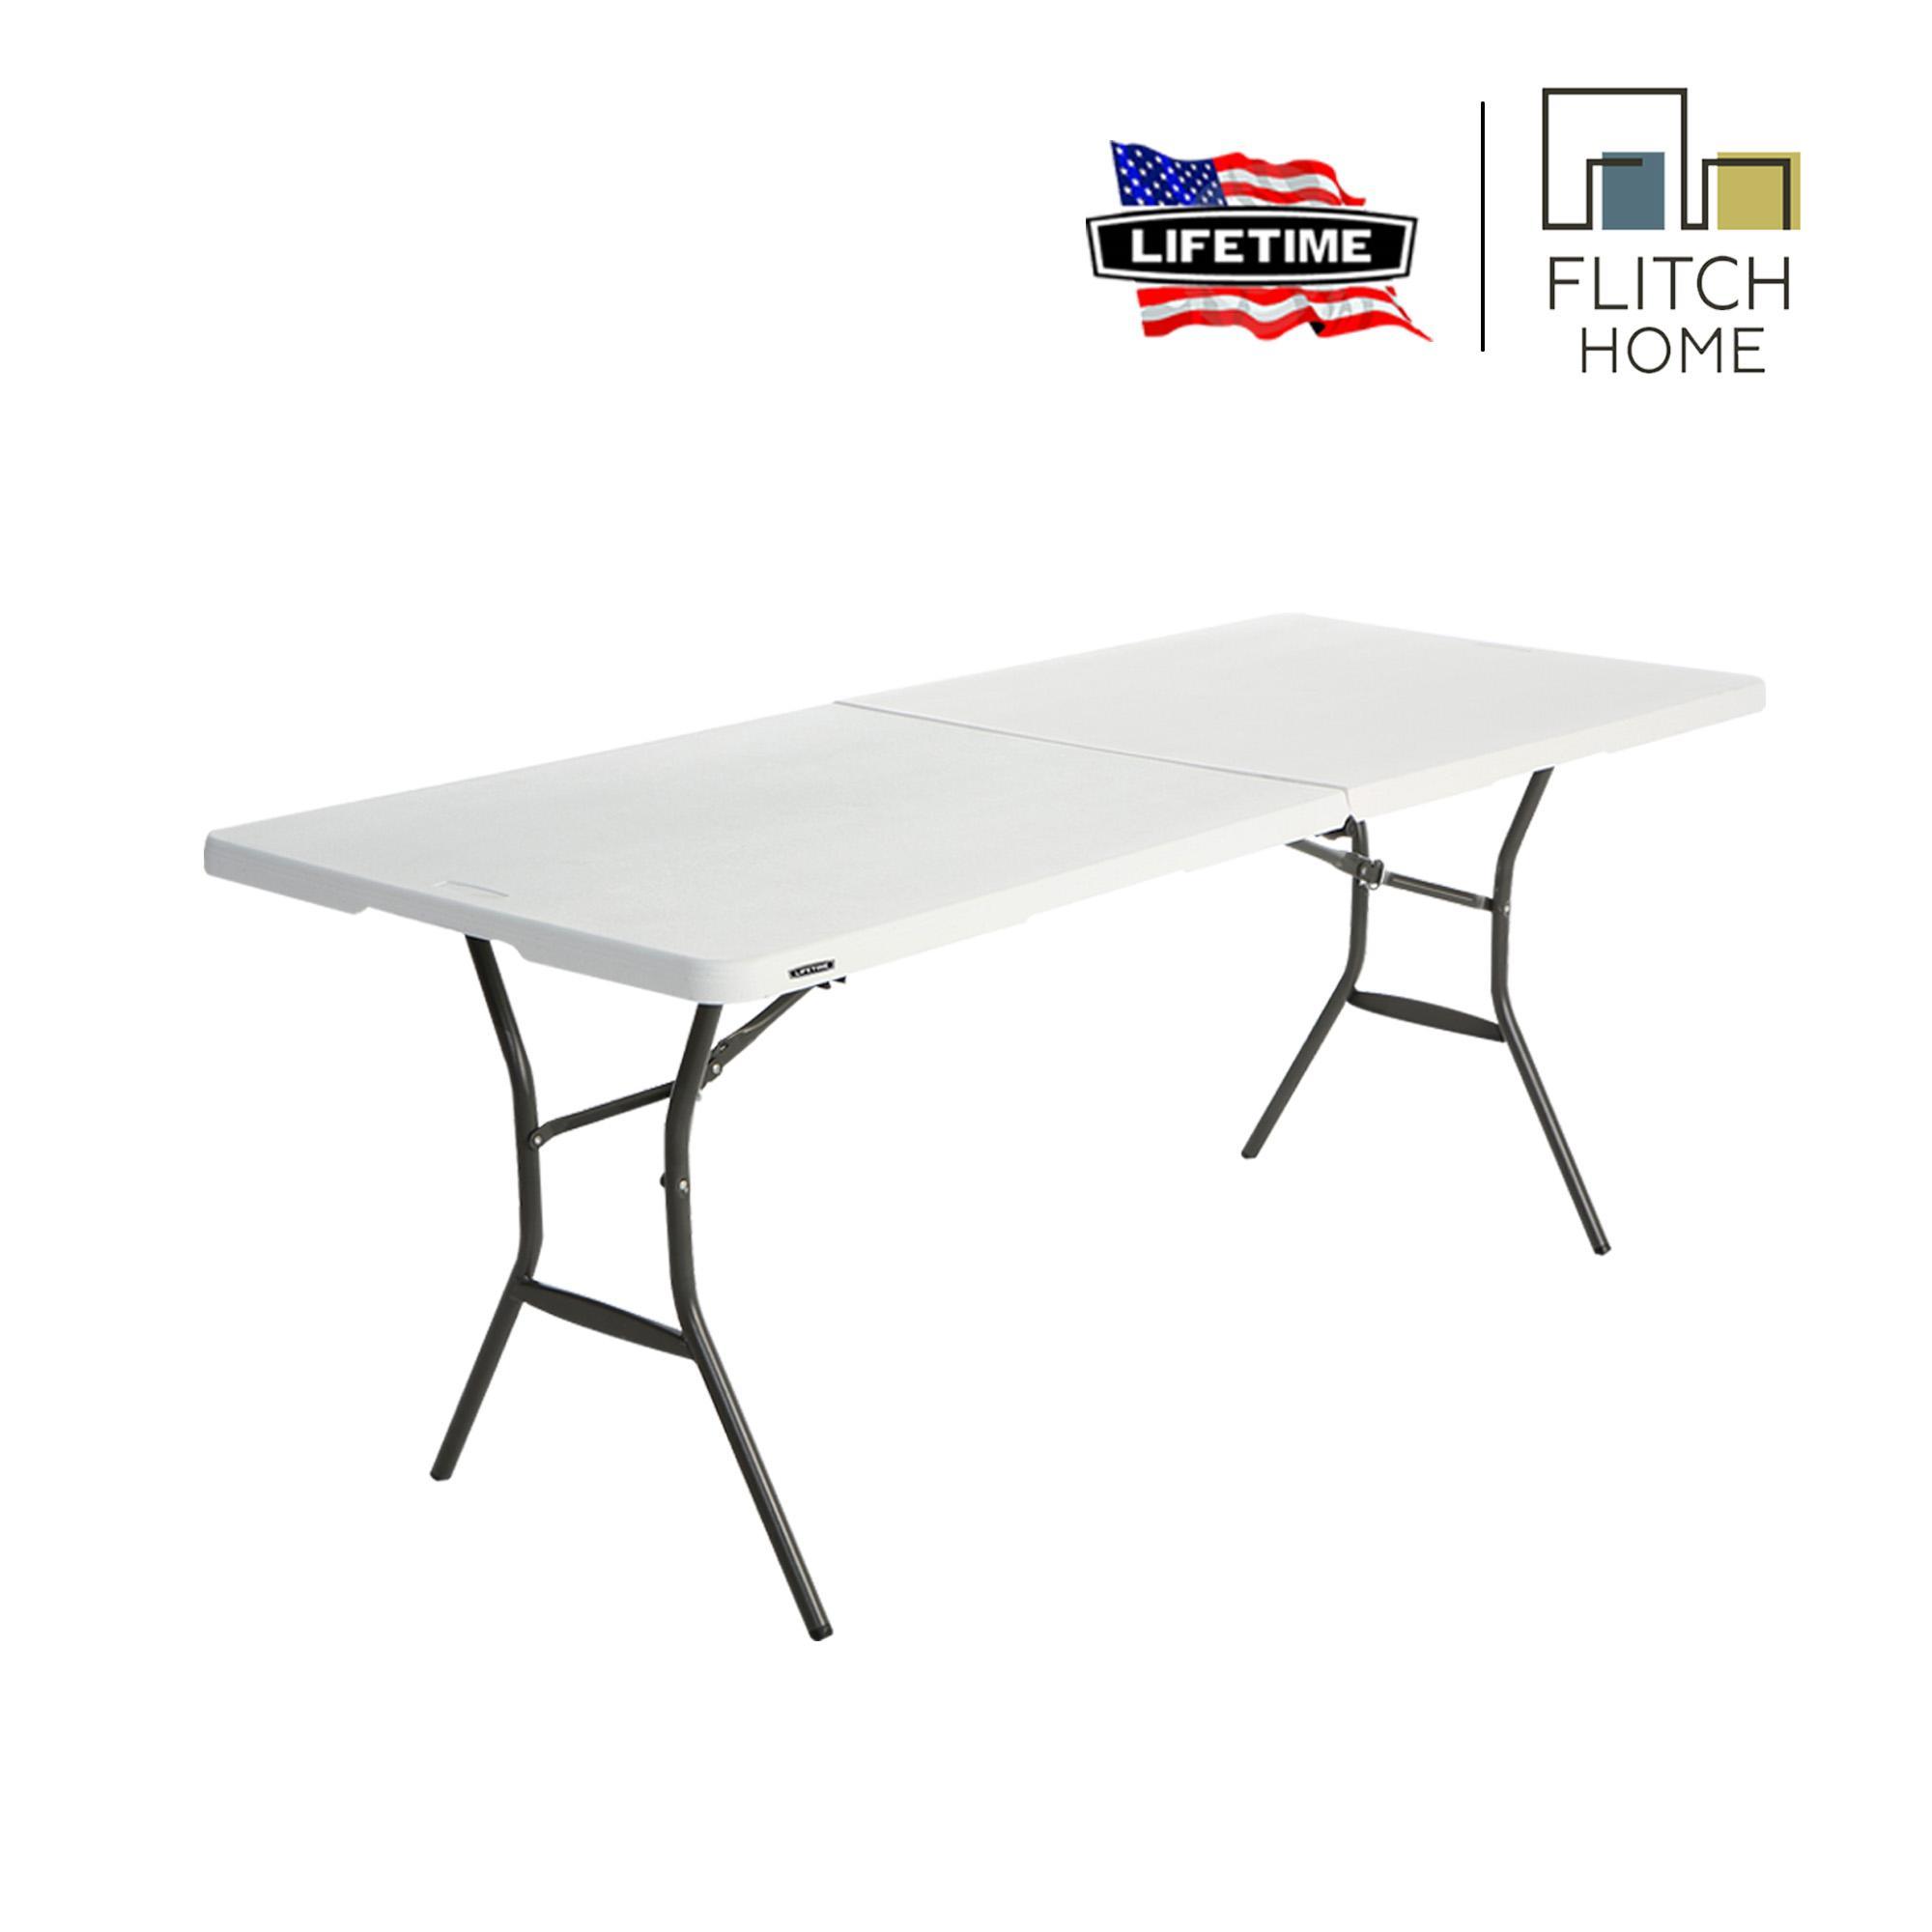 Pleasant Lifetime 5 Ft Fold In Half Table White Download Free Architecture Designs Rallybritishbridgeorg